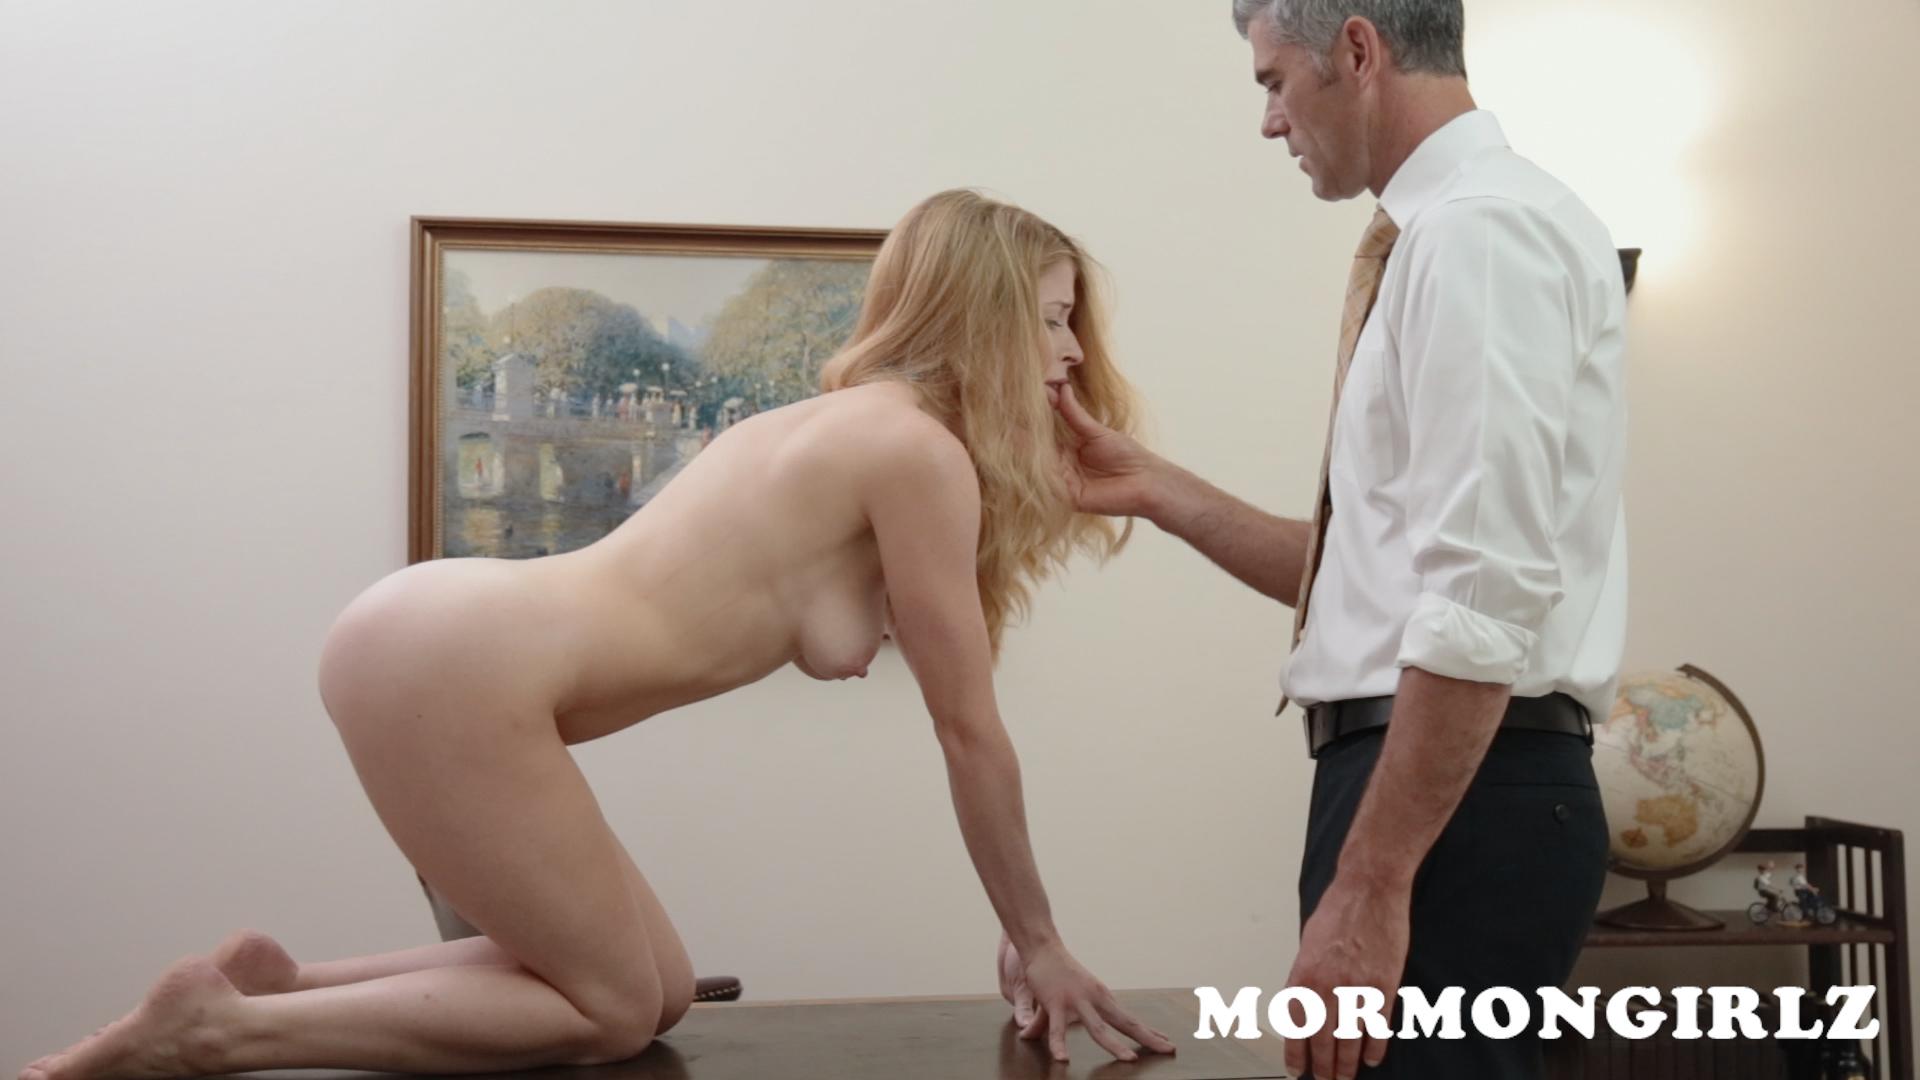 mormongirlz_70b_08